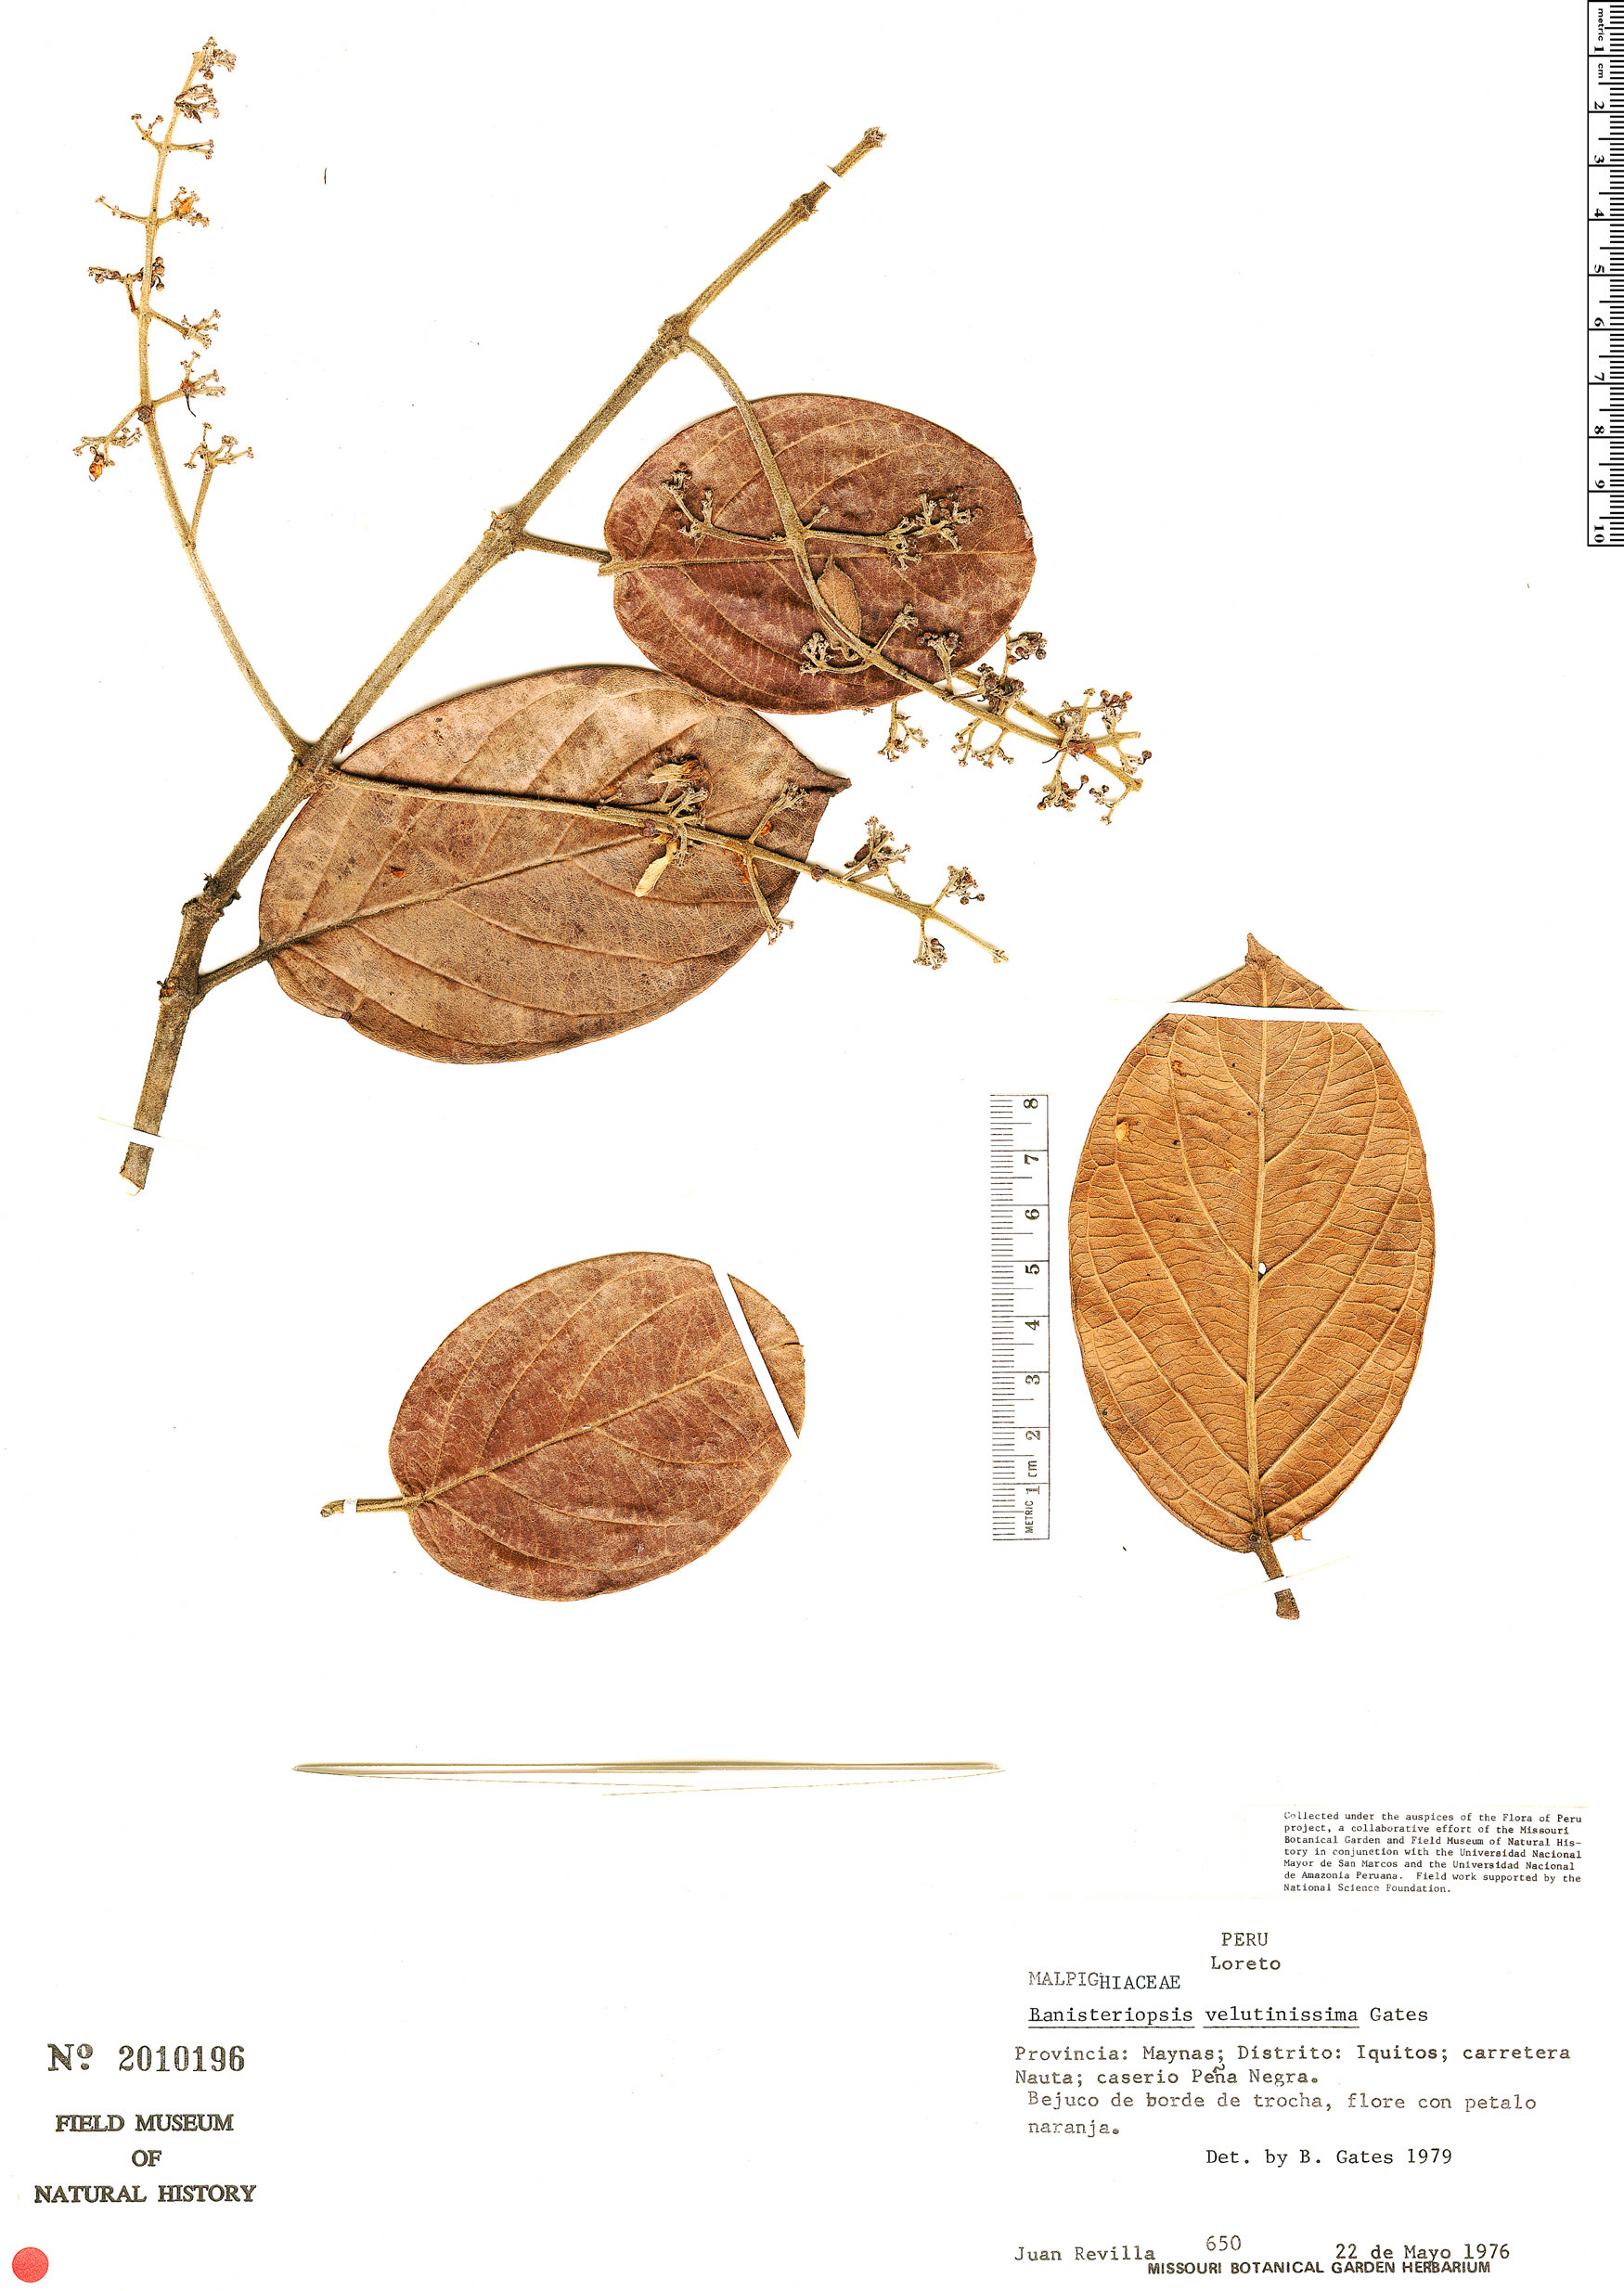 Specimen: Banisteriopsis velutinissima